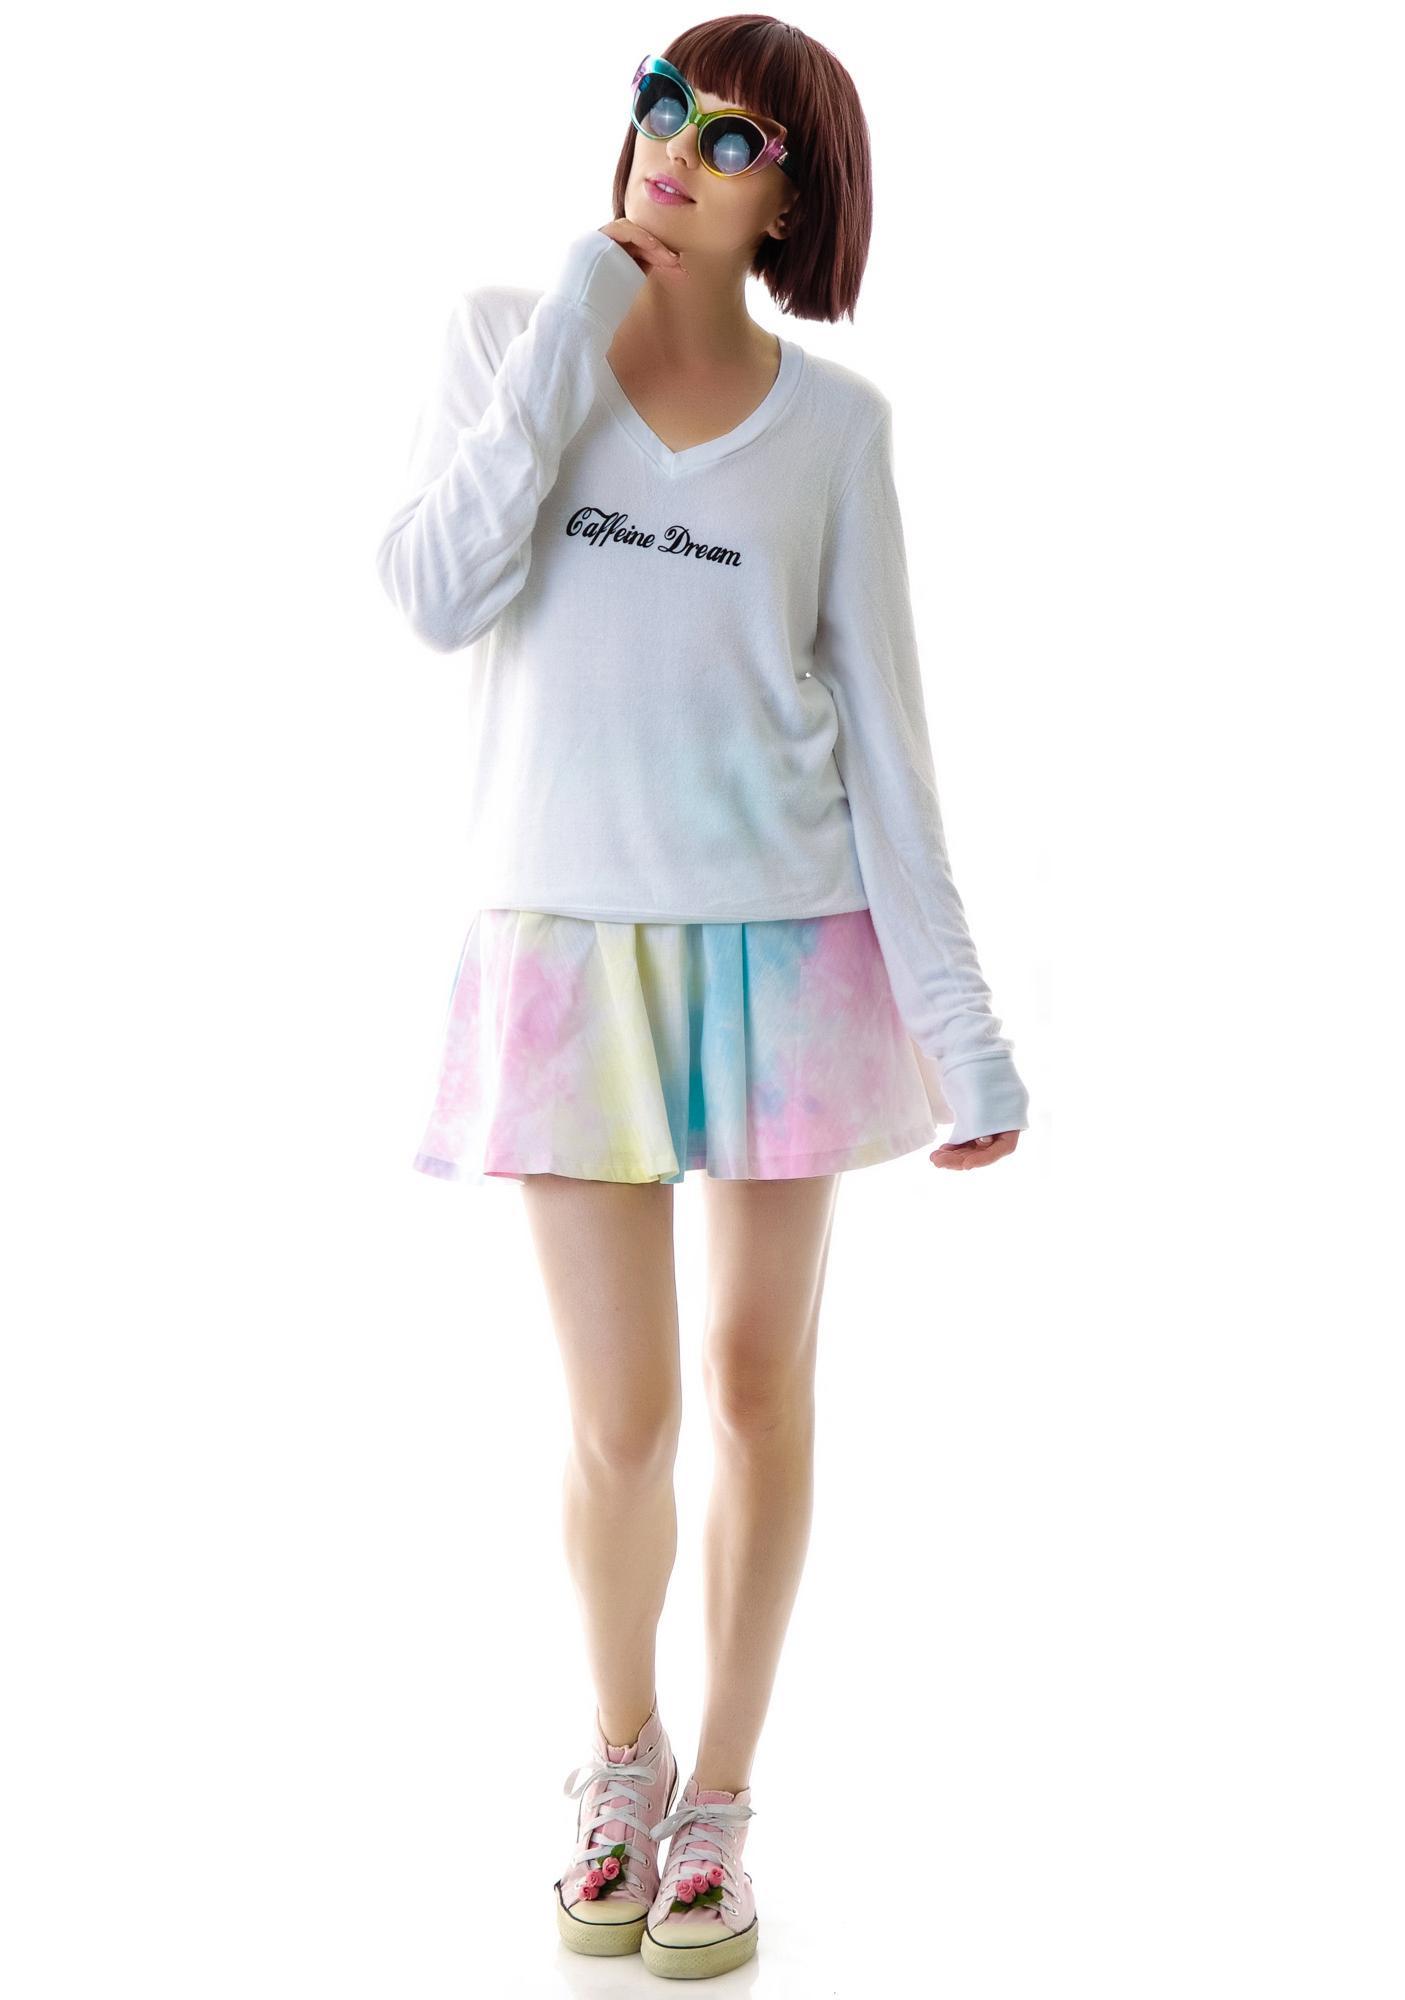 Wildfox Couture Caffeine Dream V-Neck Baggy Beach Jumper